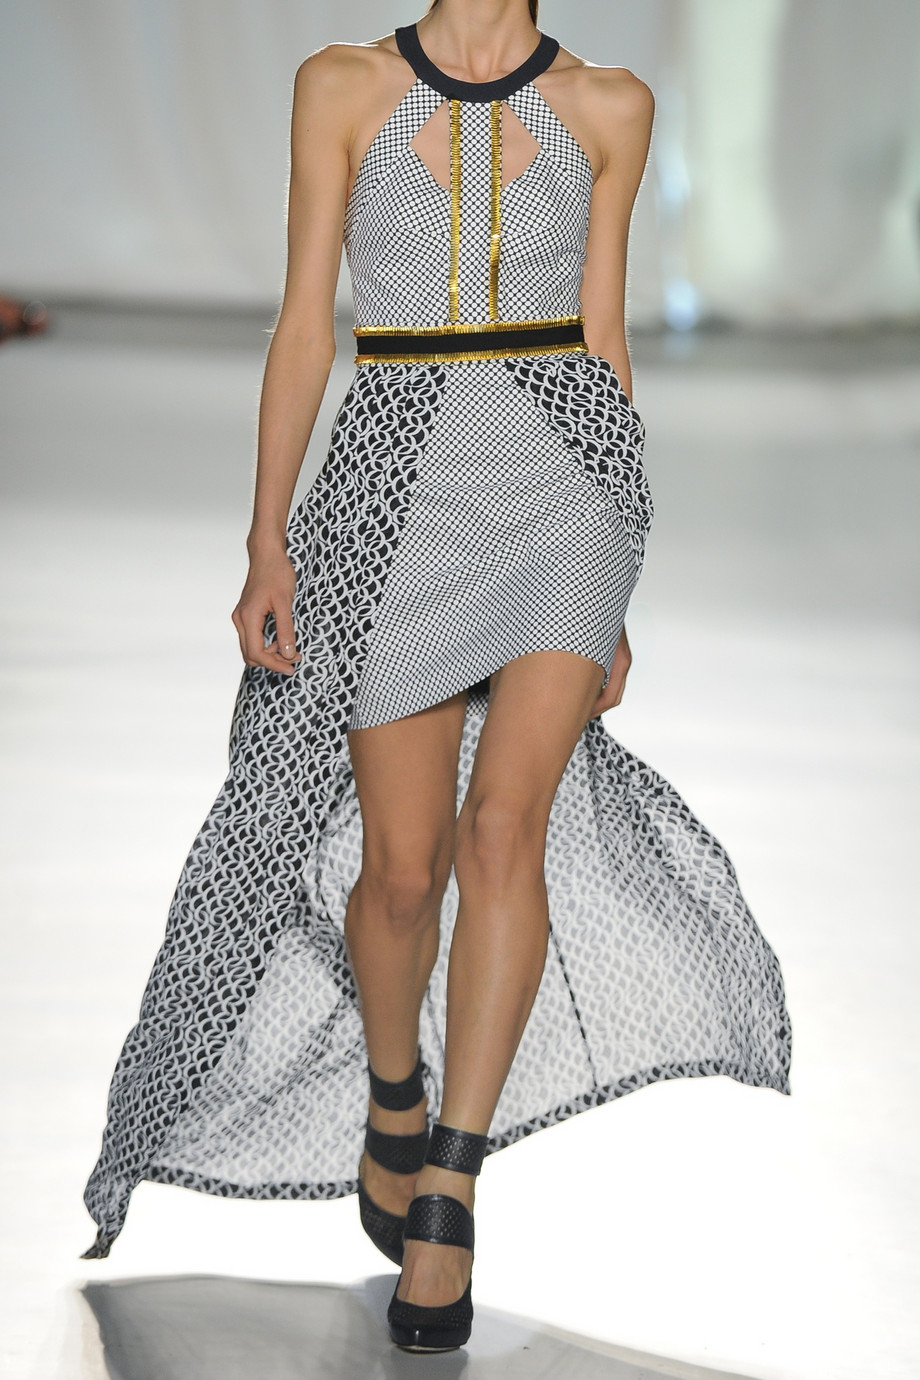 Sass and bide embellished maxi dress